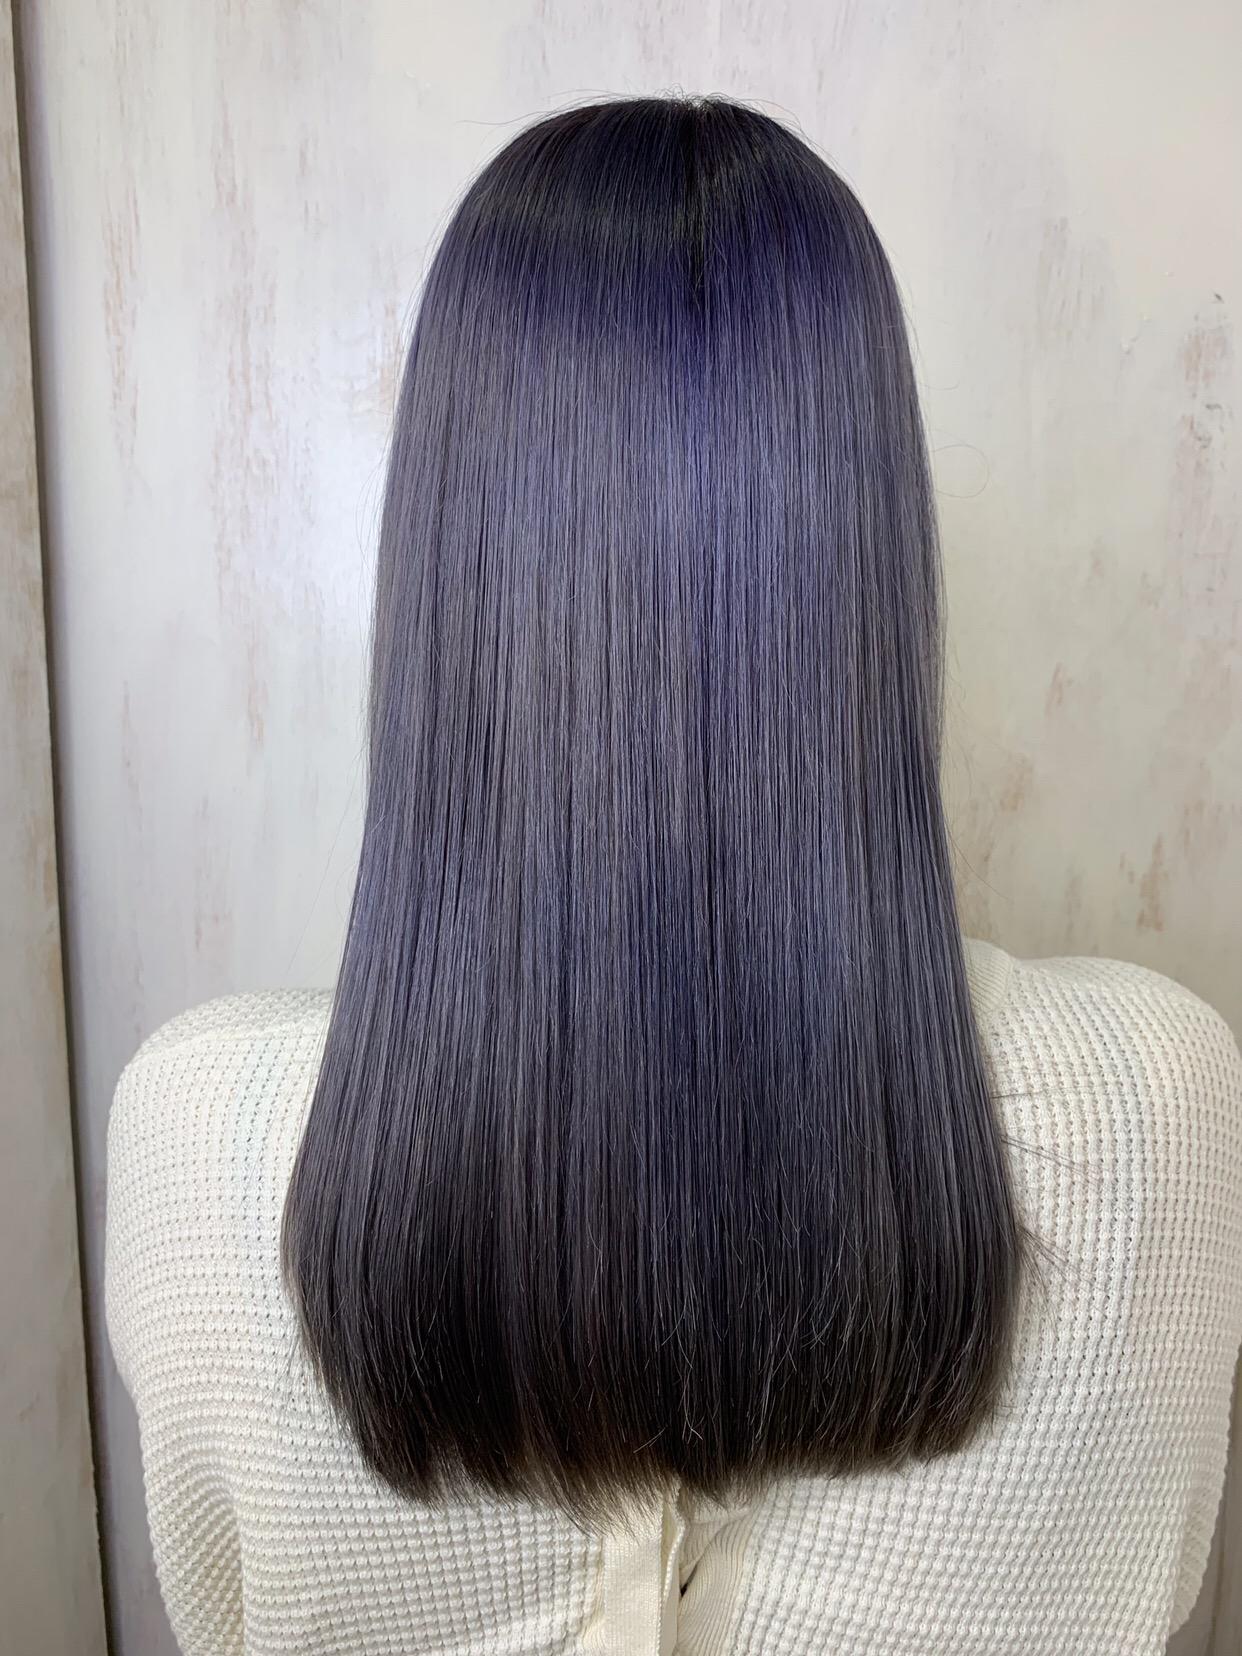 LULUトリートメント×オレオルカラーでつやっつやの艶髪。原宿・表参道『1000人をツヤ髪にヘアケア美容師の挑戦』